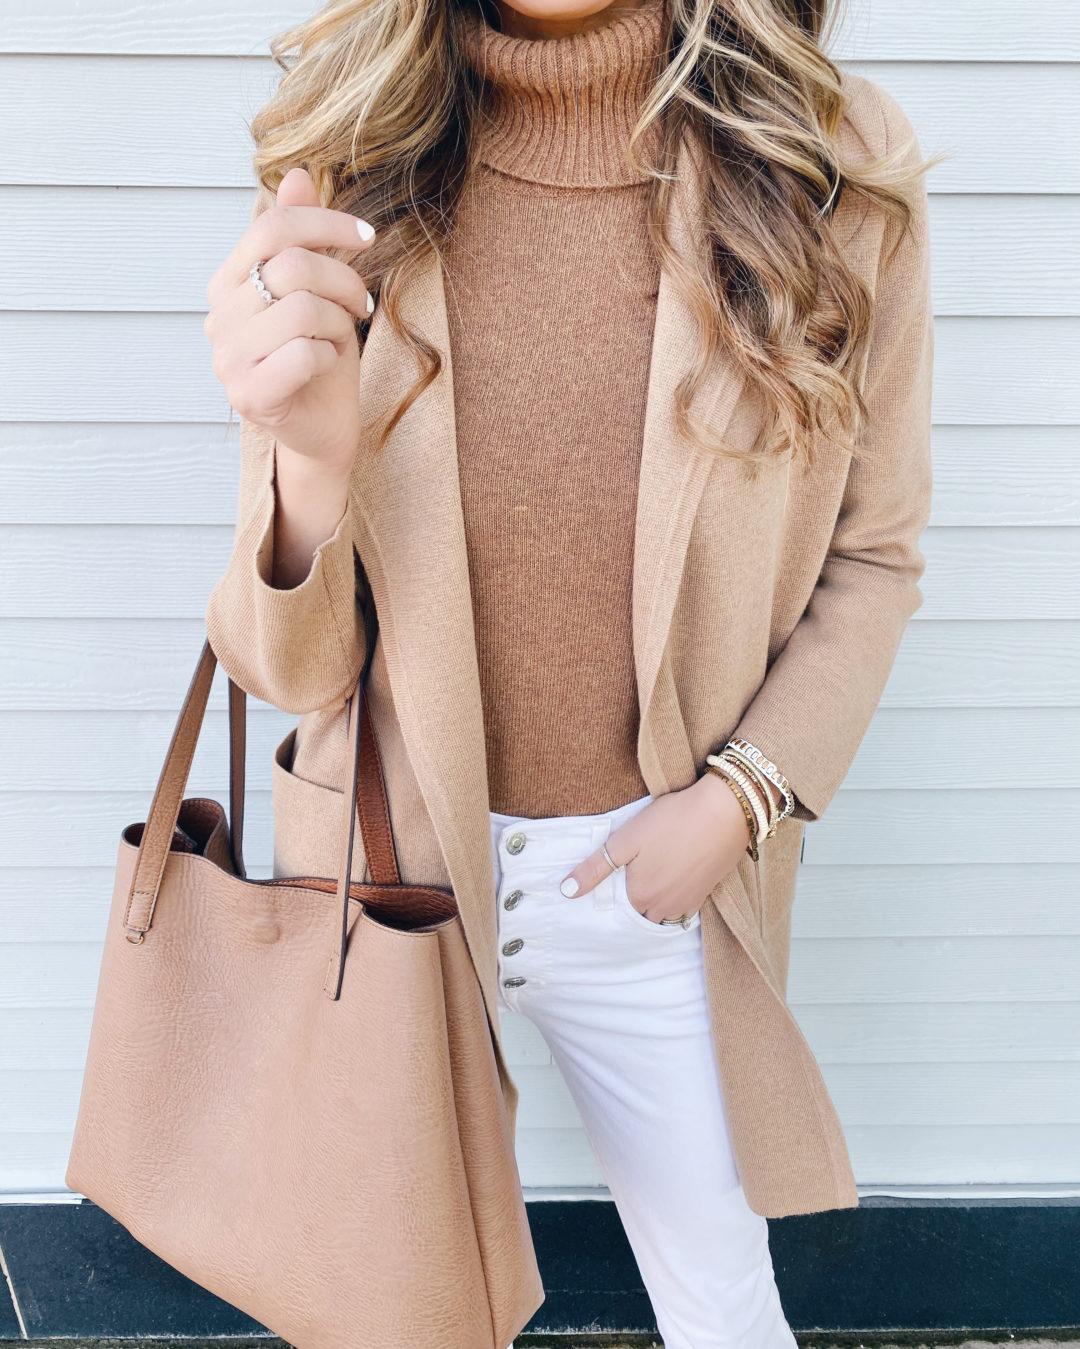 camel sweater coat - black friday sale round up - pinteresting plans